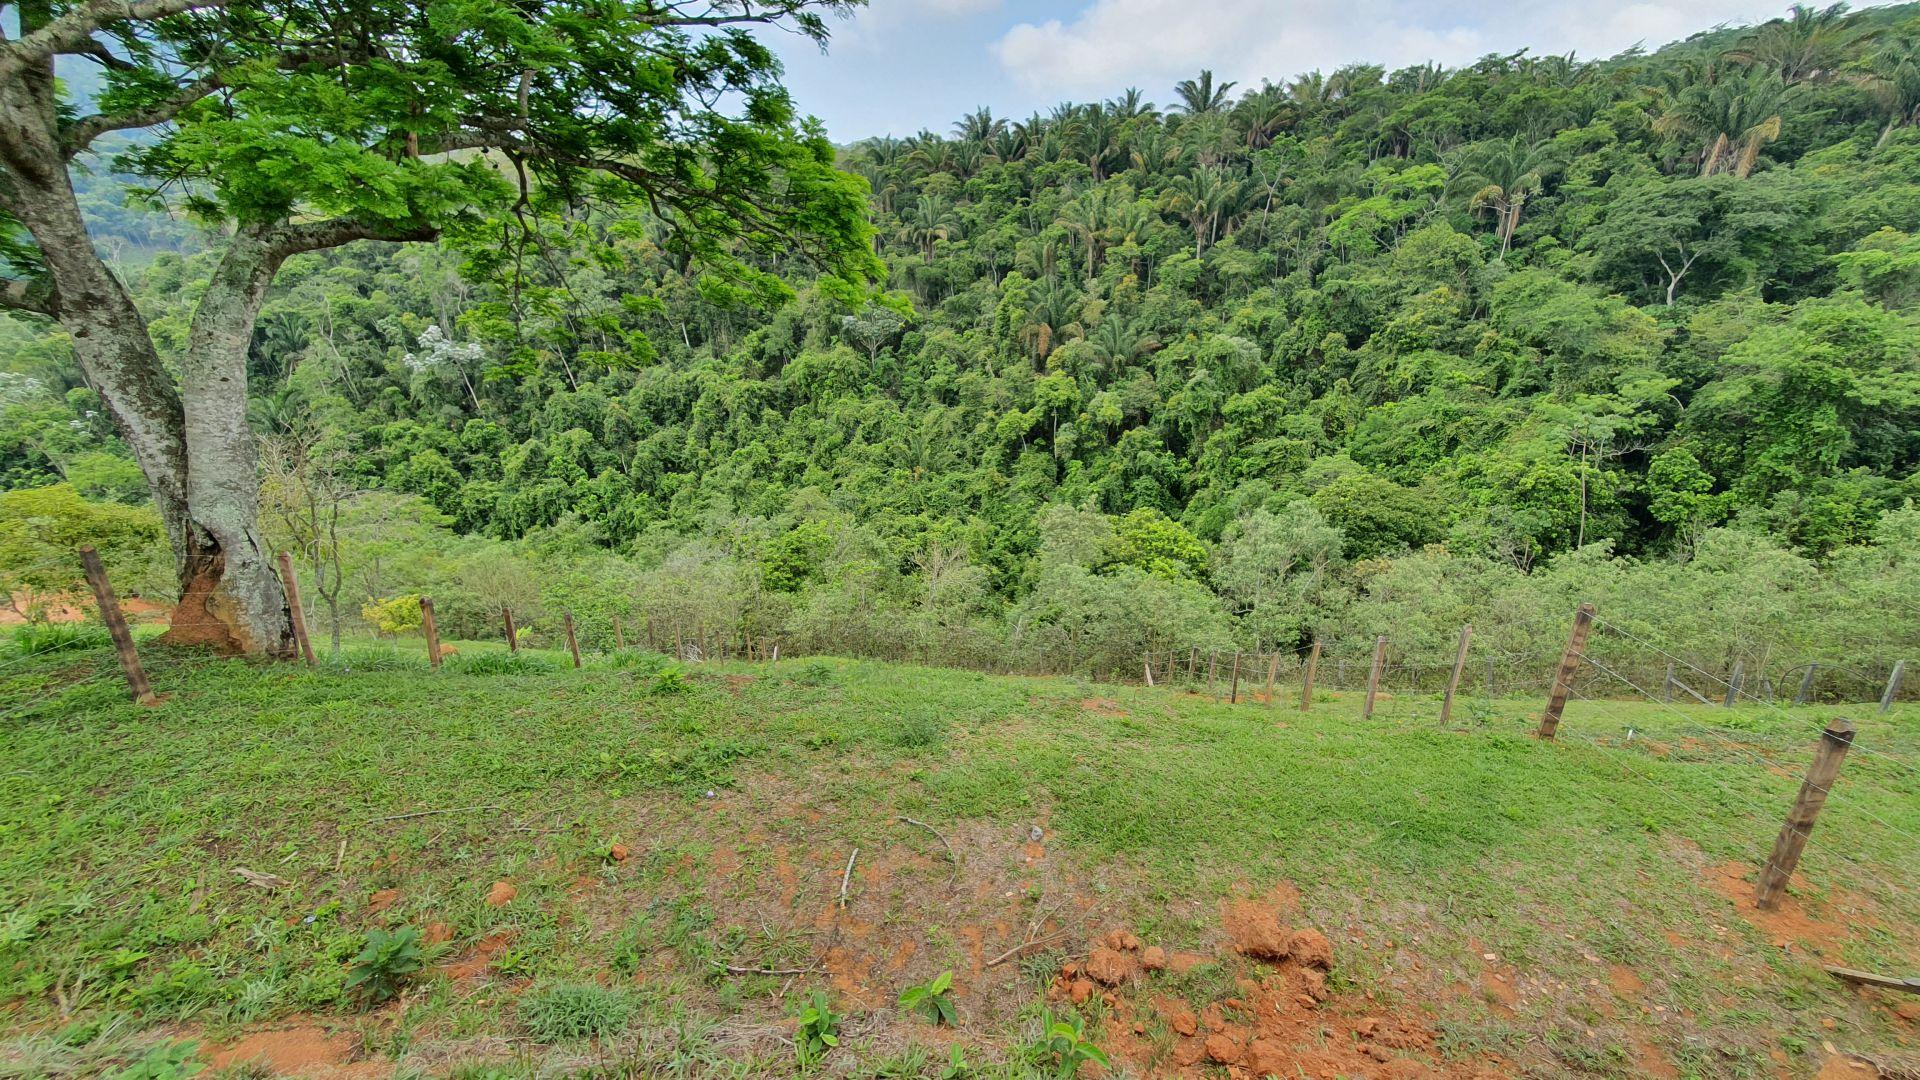 Terreno 442m² à venda Morro Azul, Engenheiro Paulo de Frontin - R$ 45.000 - trmr45 - 3